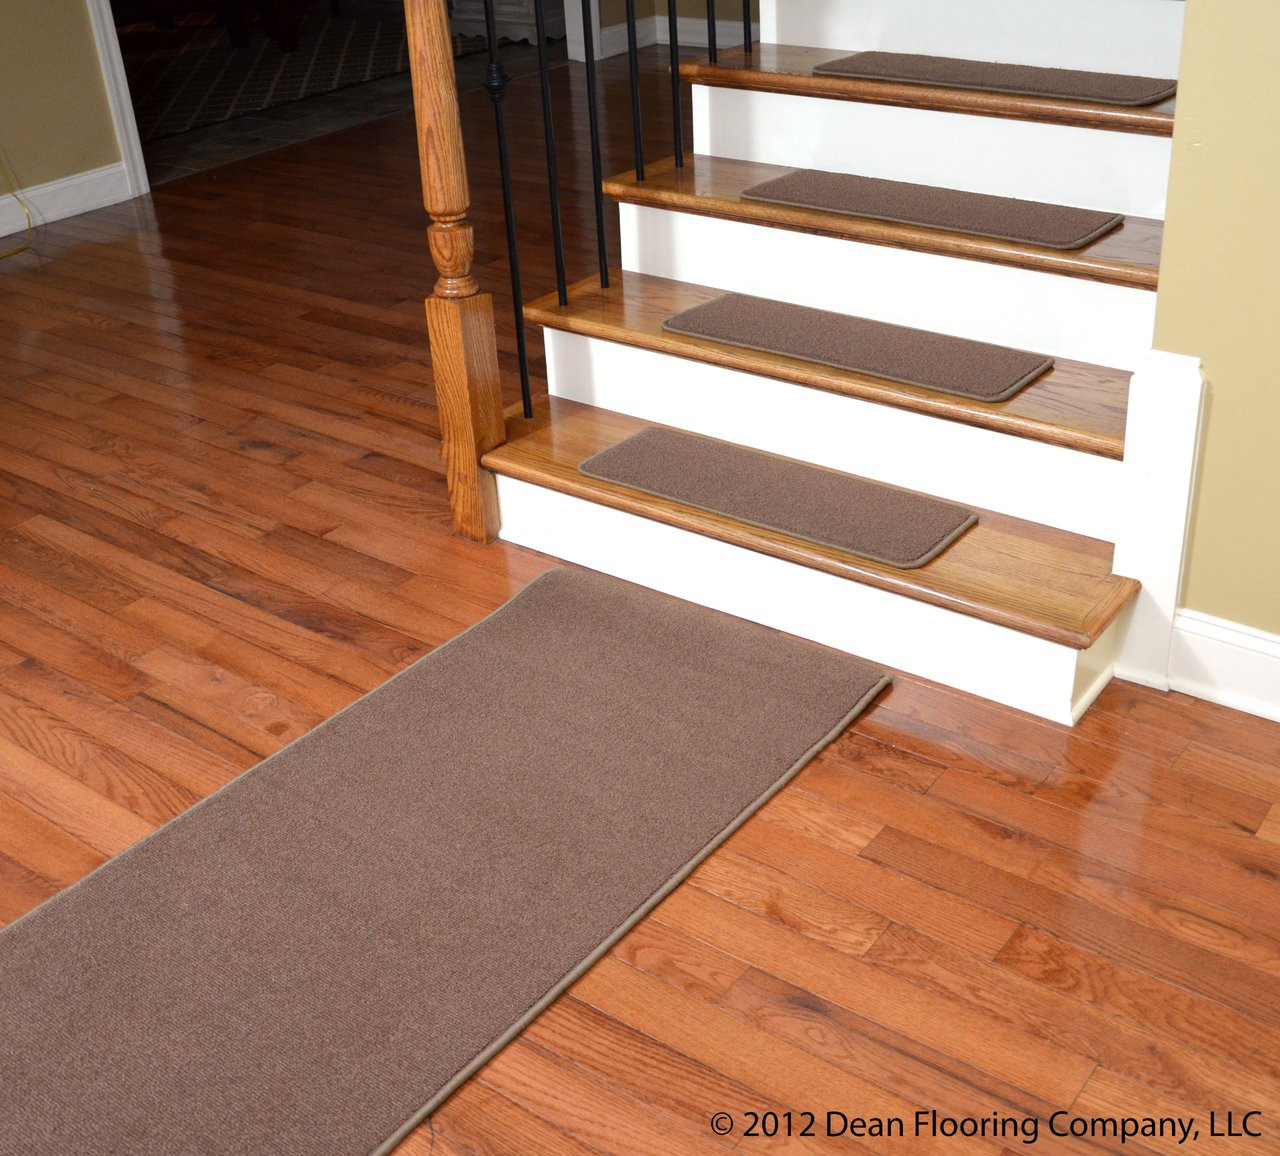 Dean Premium Stainmaster Nylon Carpet Stair Treads